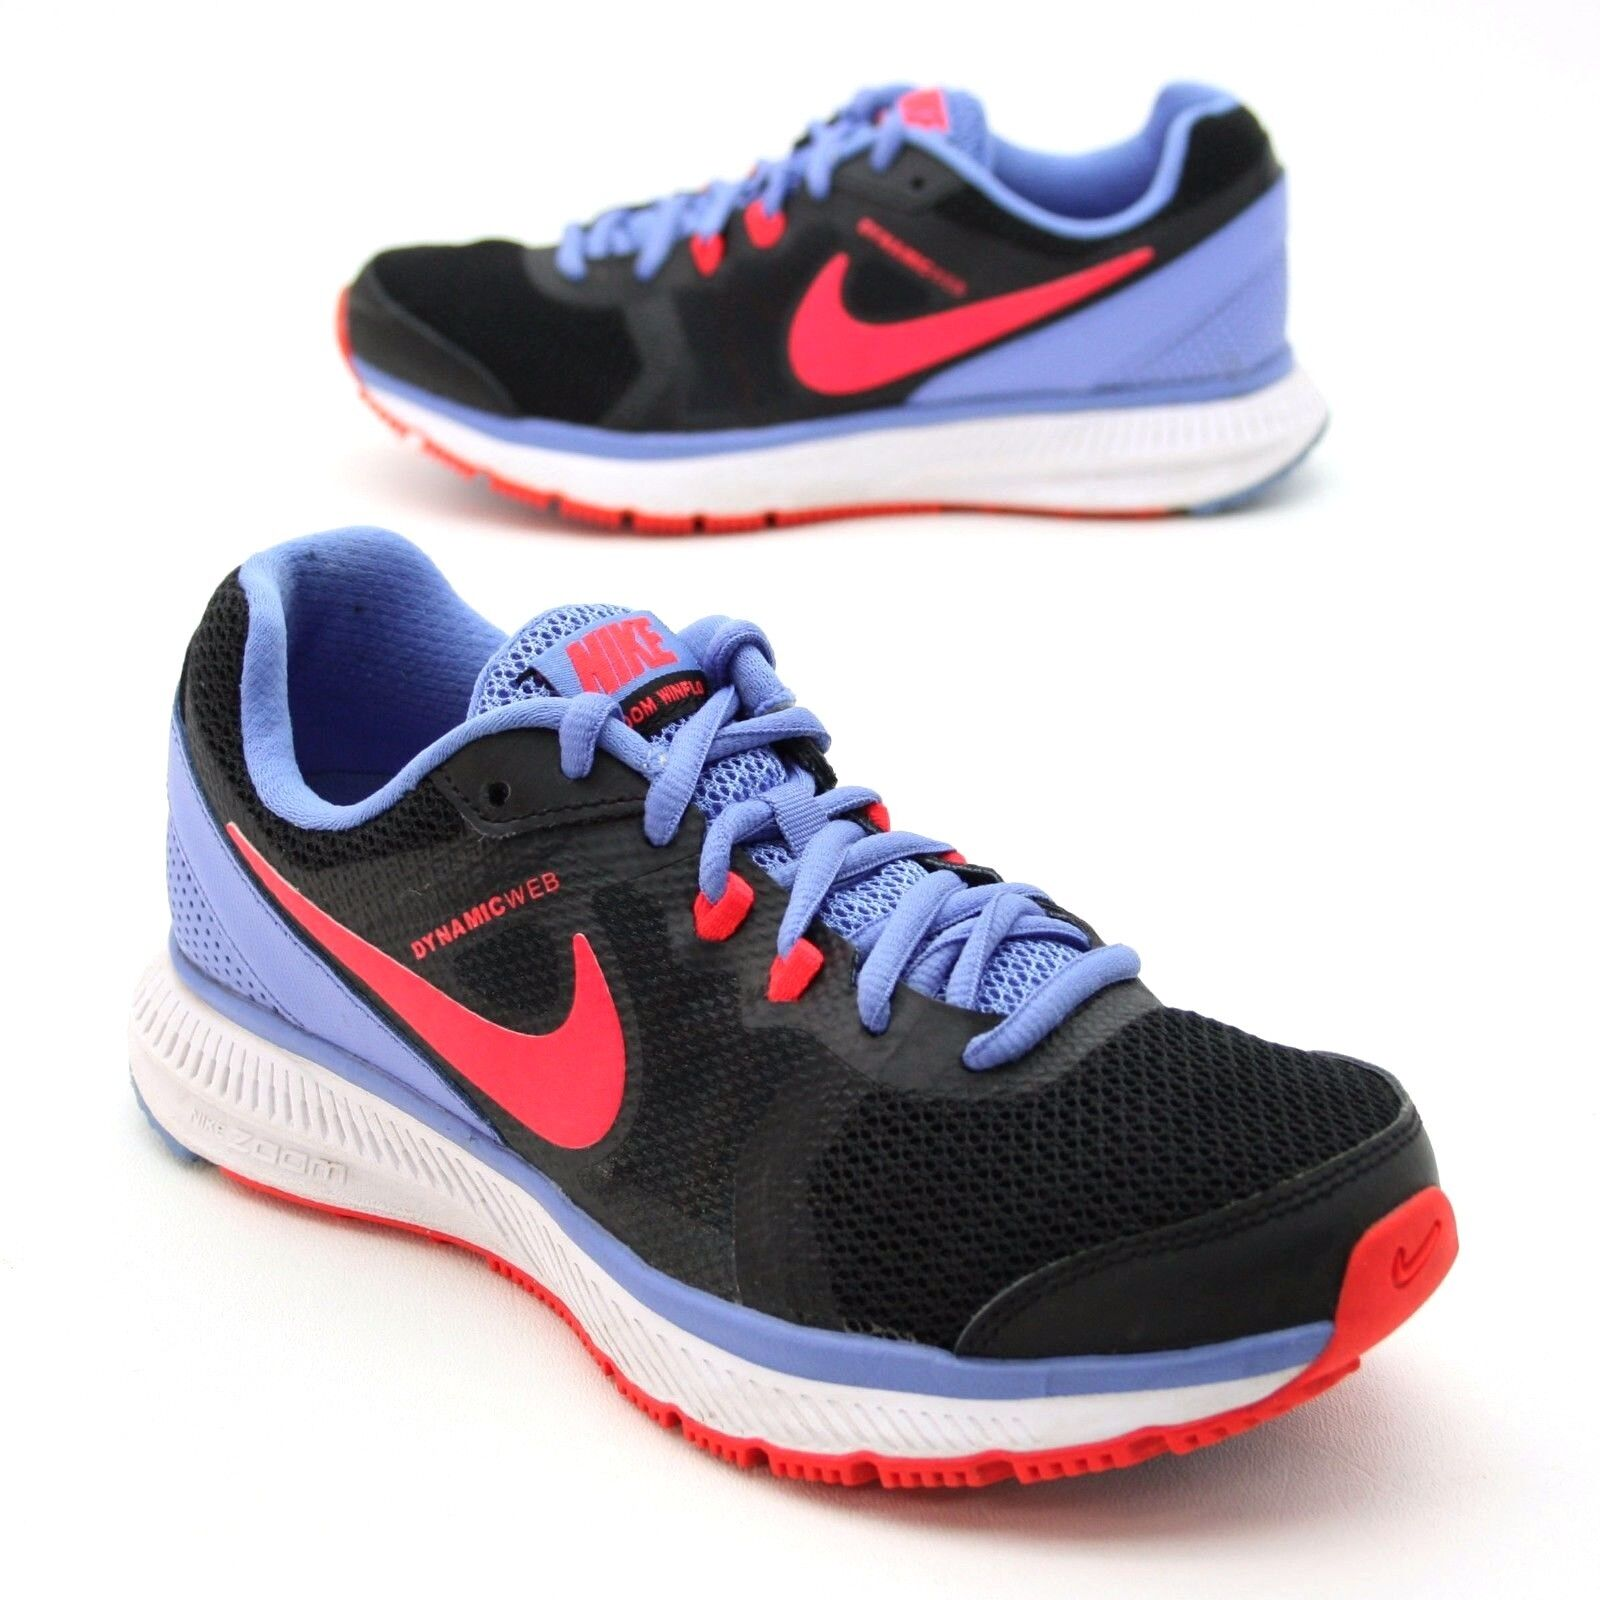 Nike Ladies Trainers 6/36.5 Zoom Winflo Running Trainers Ladies DynamicWeb Athletic Sneakers 7ca081